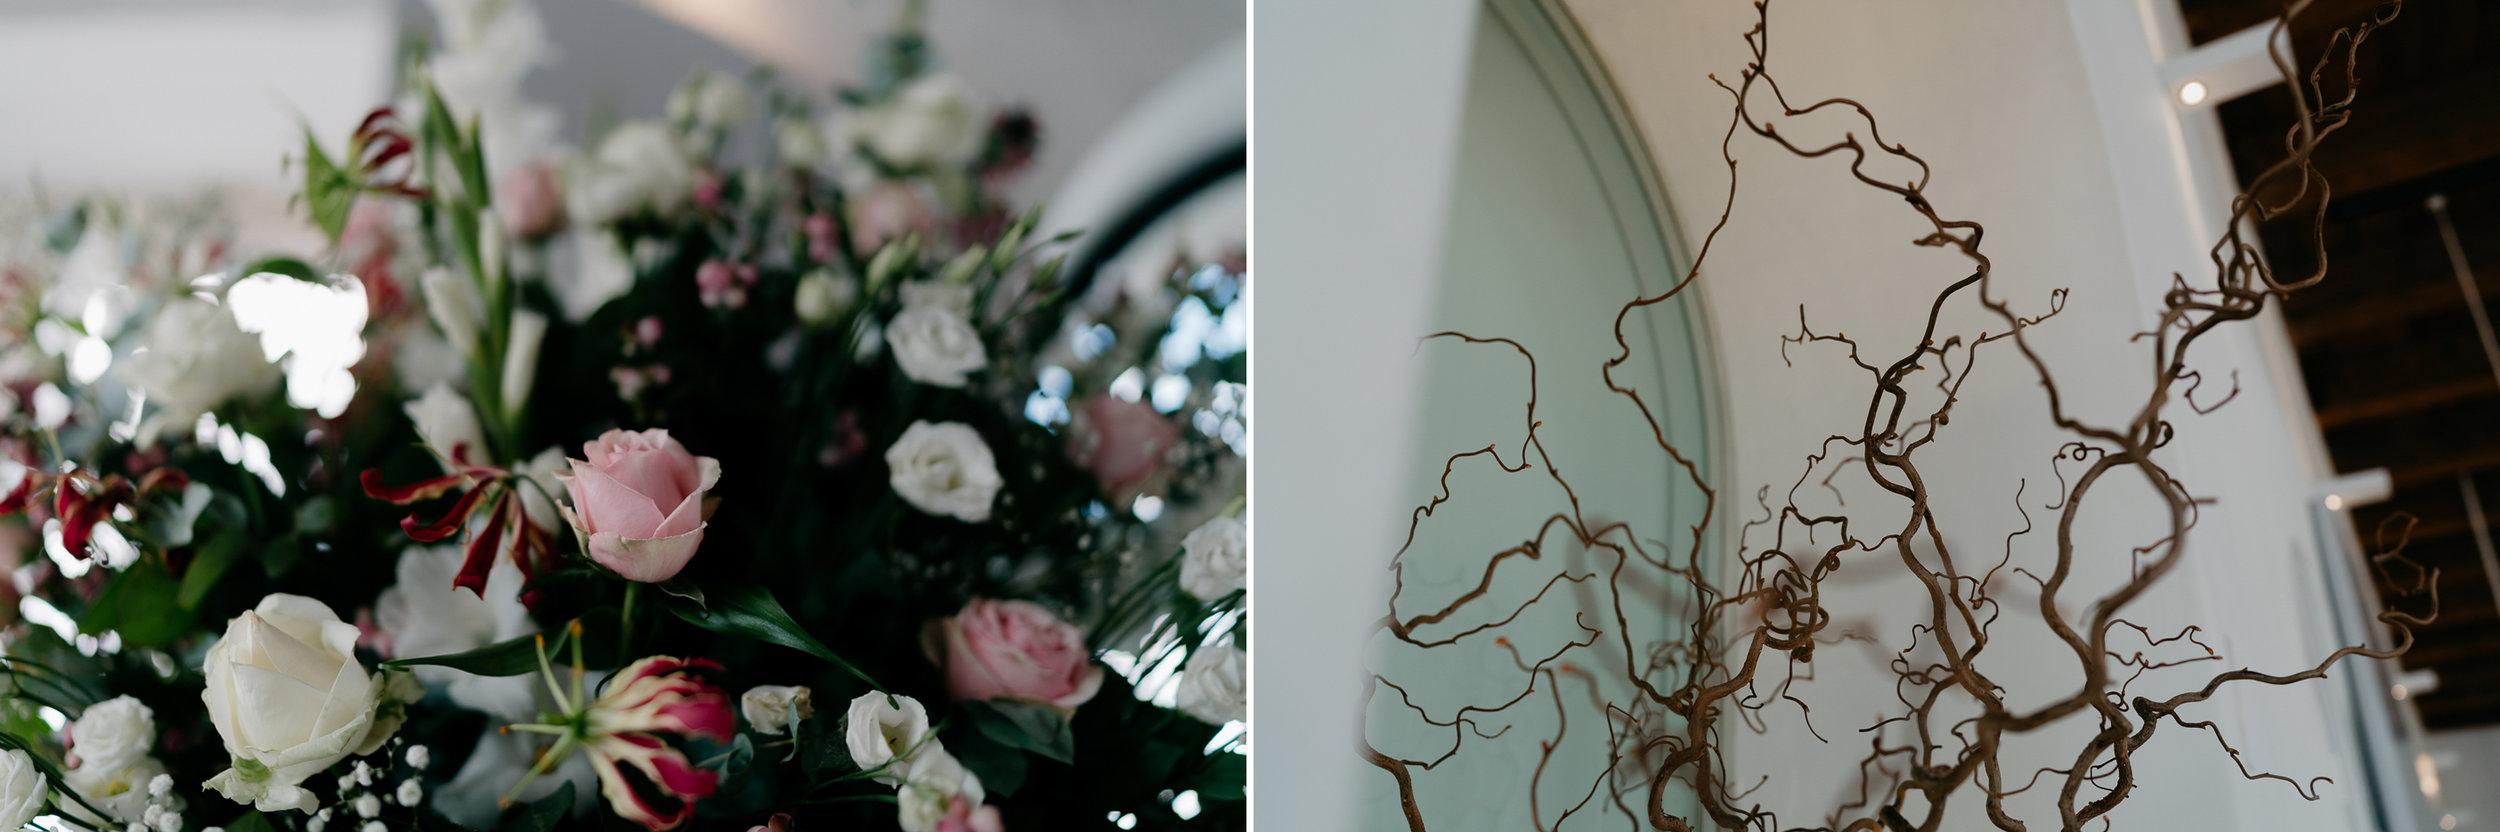 bruidsfotografie-trouwfotograaf-wedding-photographer-amsterdam-James-Jantine-097 copy.jpg